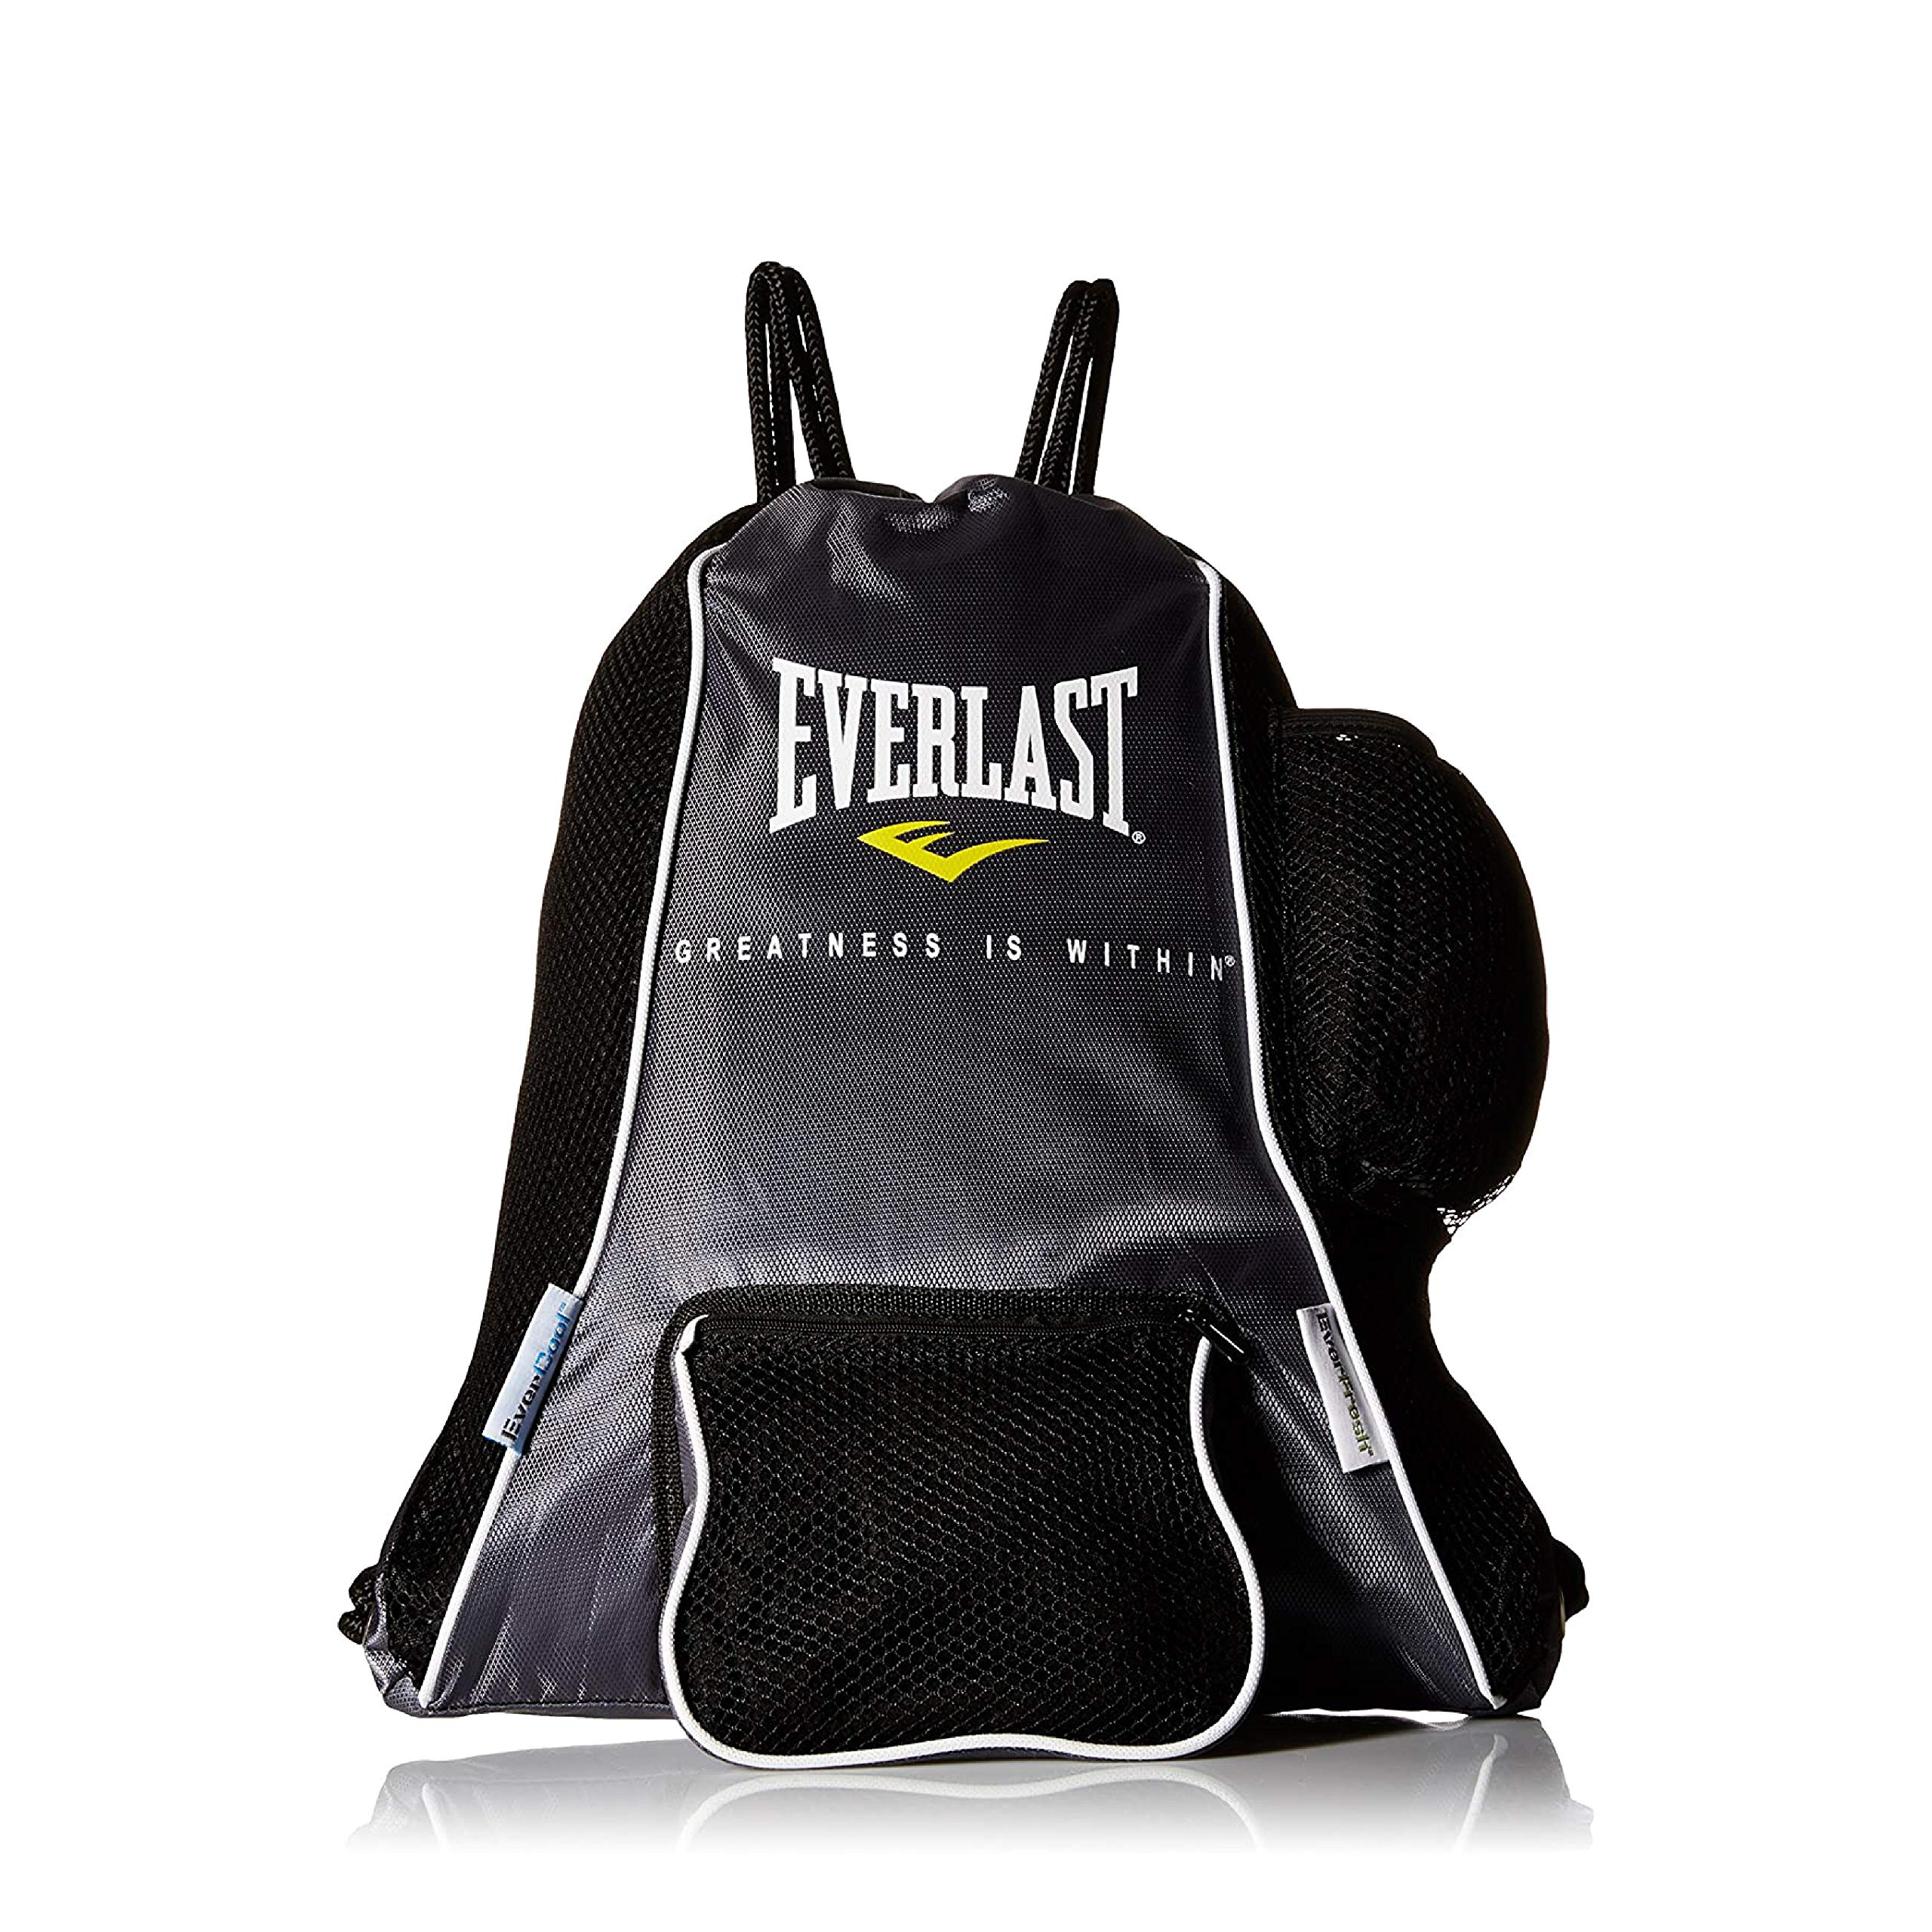 Everlast 420D Glove Bag